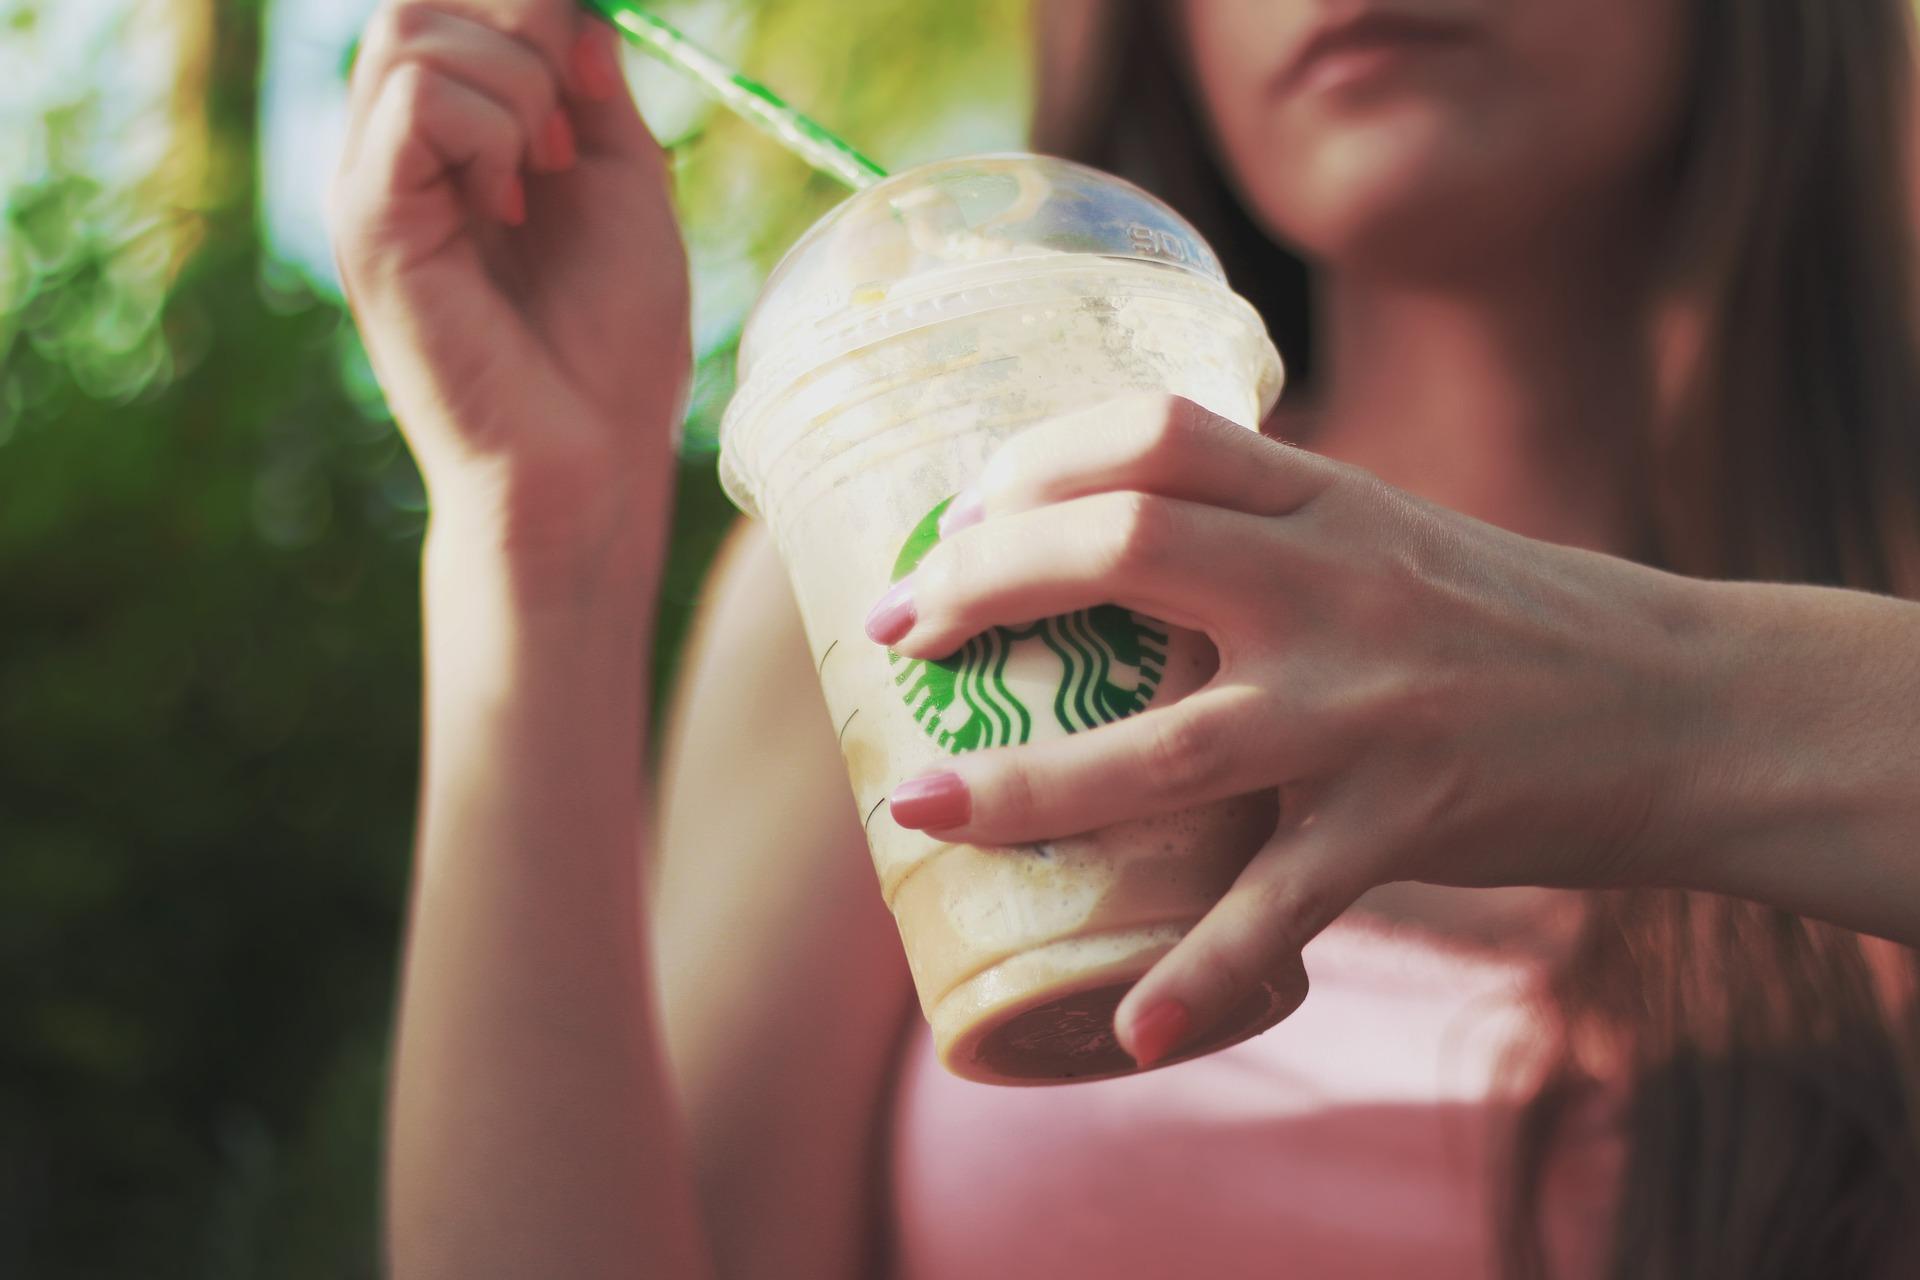 Starbucks Phantom Frappuccino. Что такое фантомное Фраппучино в Starbucks?